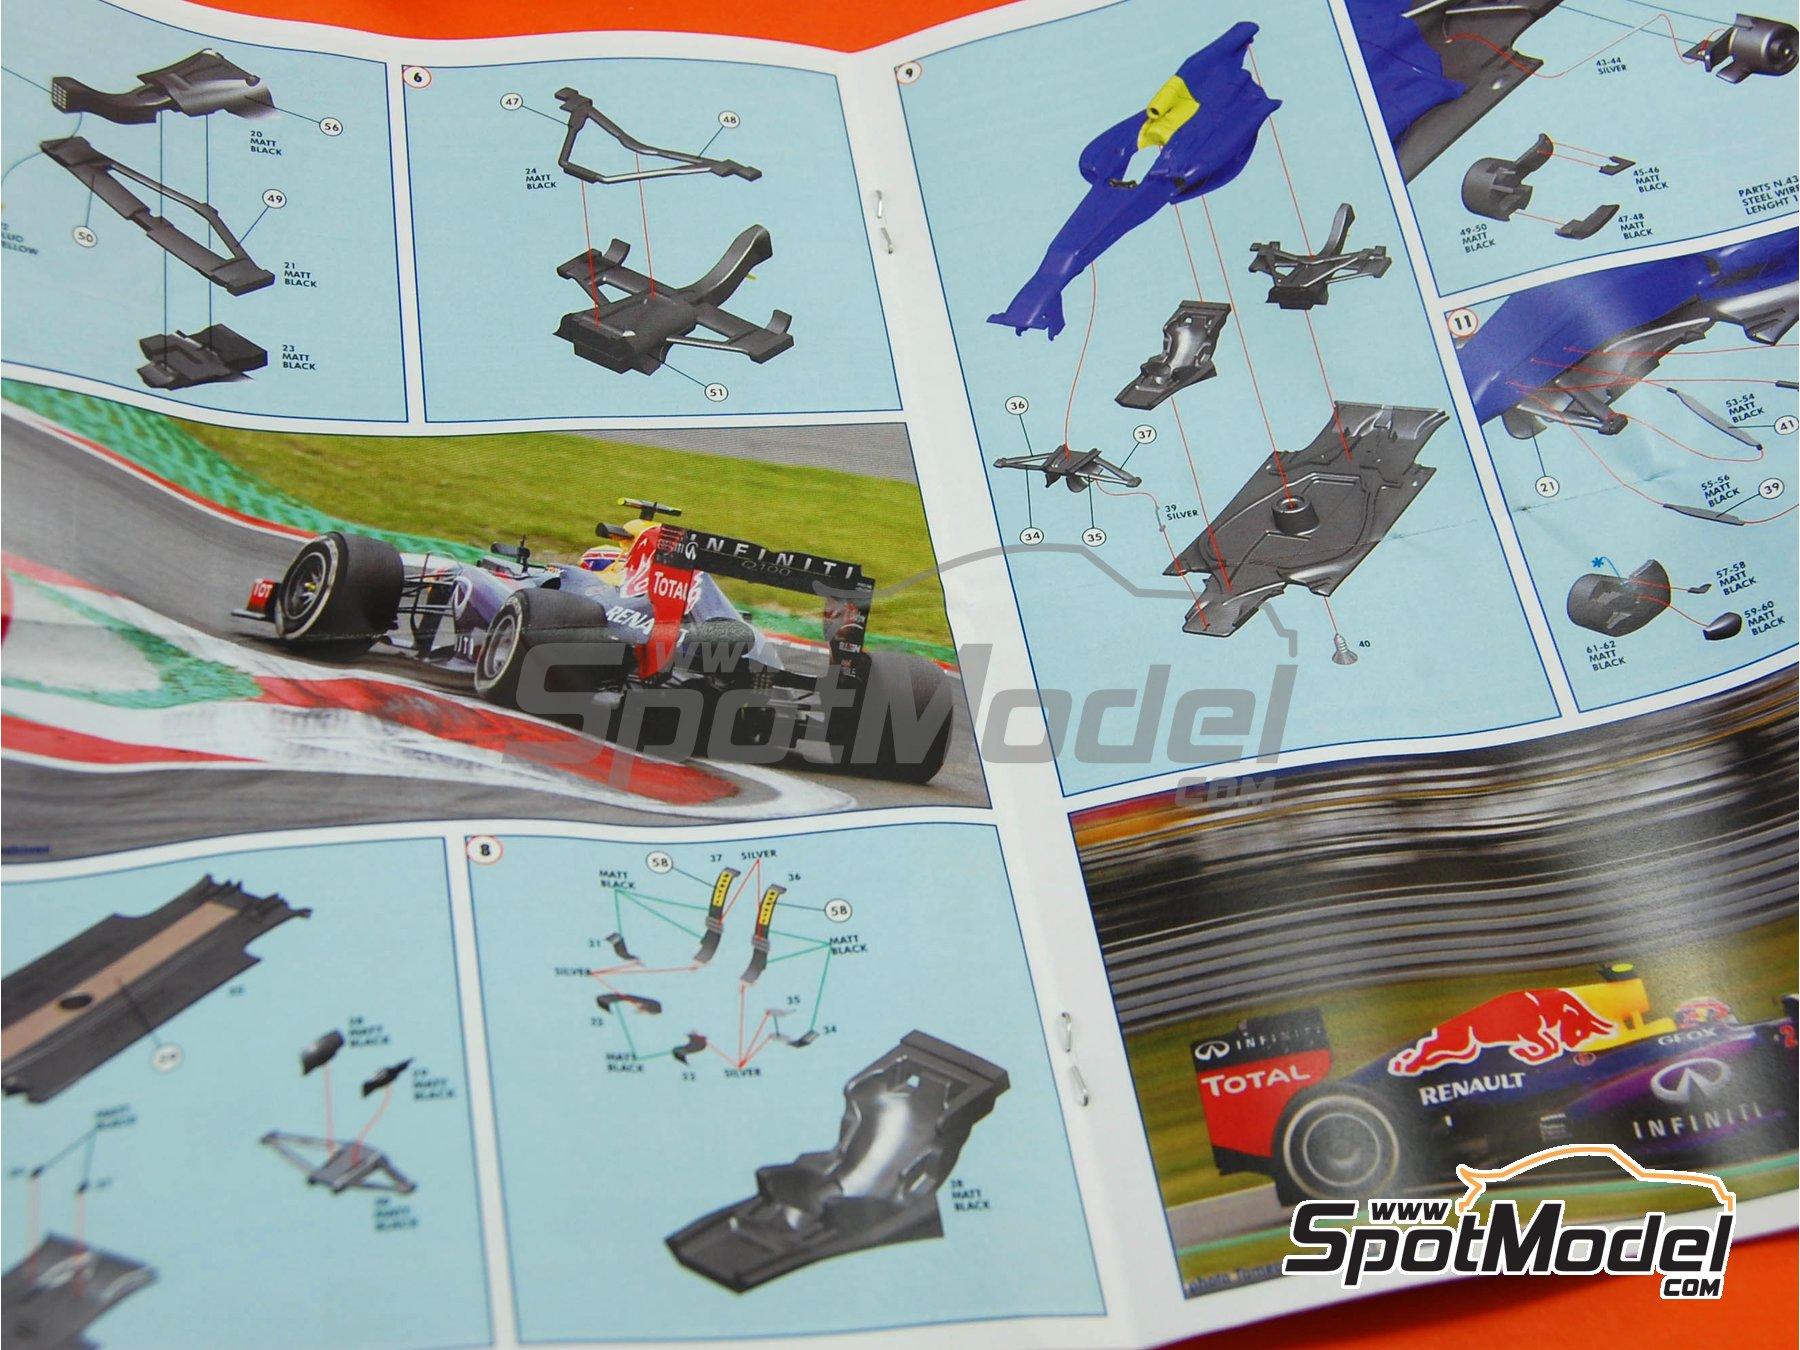 Image 10: RB Racing Renault RB9 Infiniti - German Formula 1 Grand Prix 2013 | Model car kit in 1/43 scale manufactured by Tameo Kits (ref.TMK416)